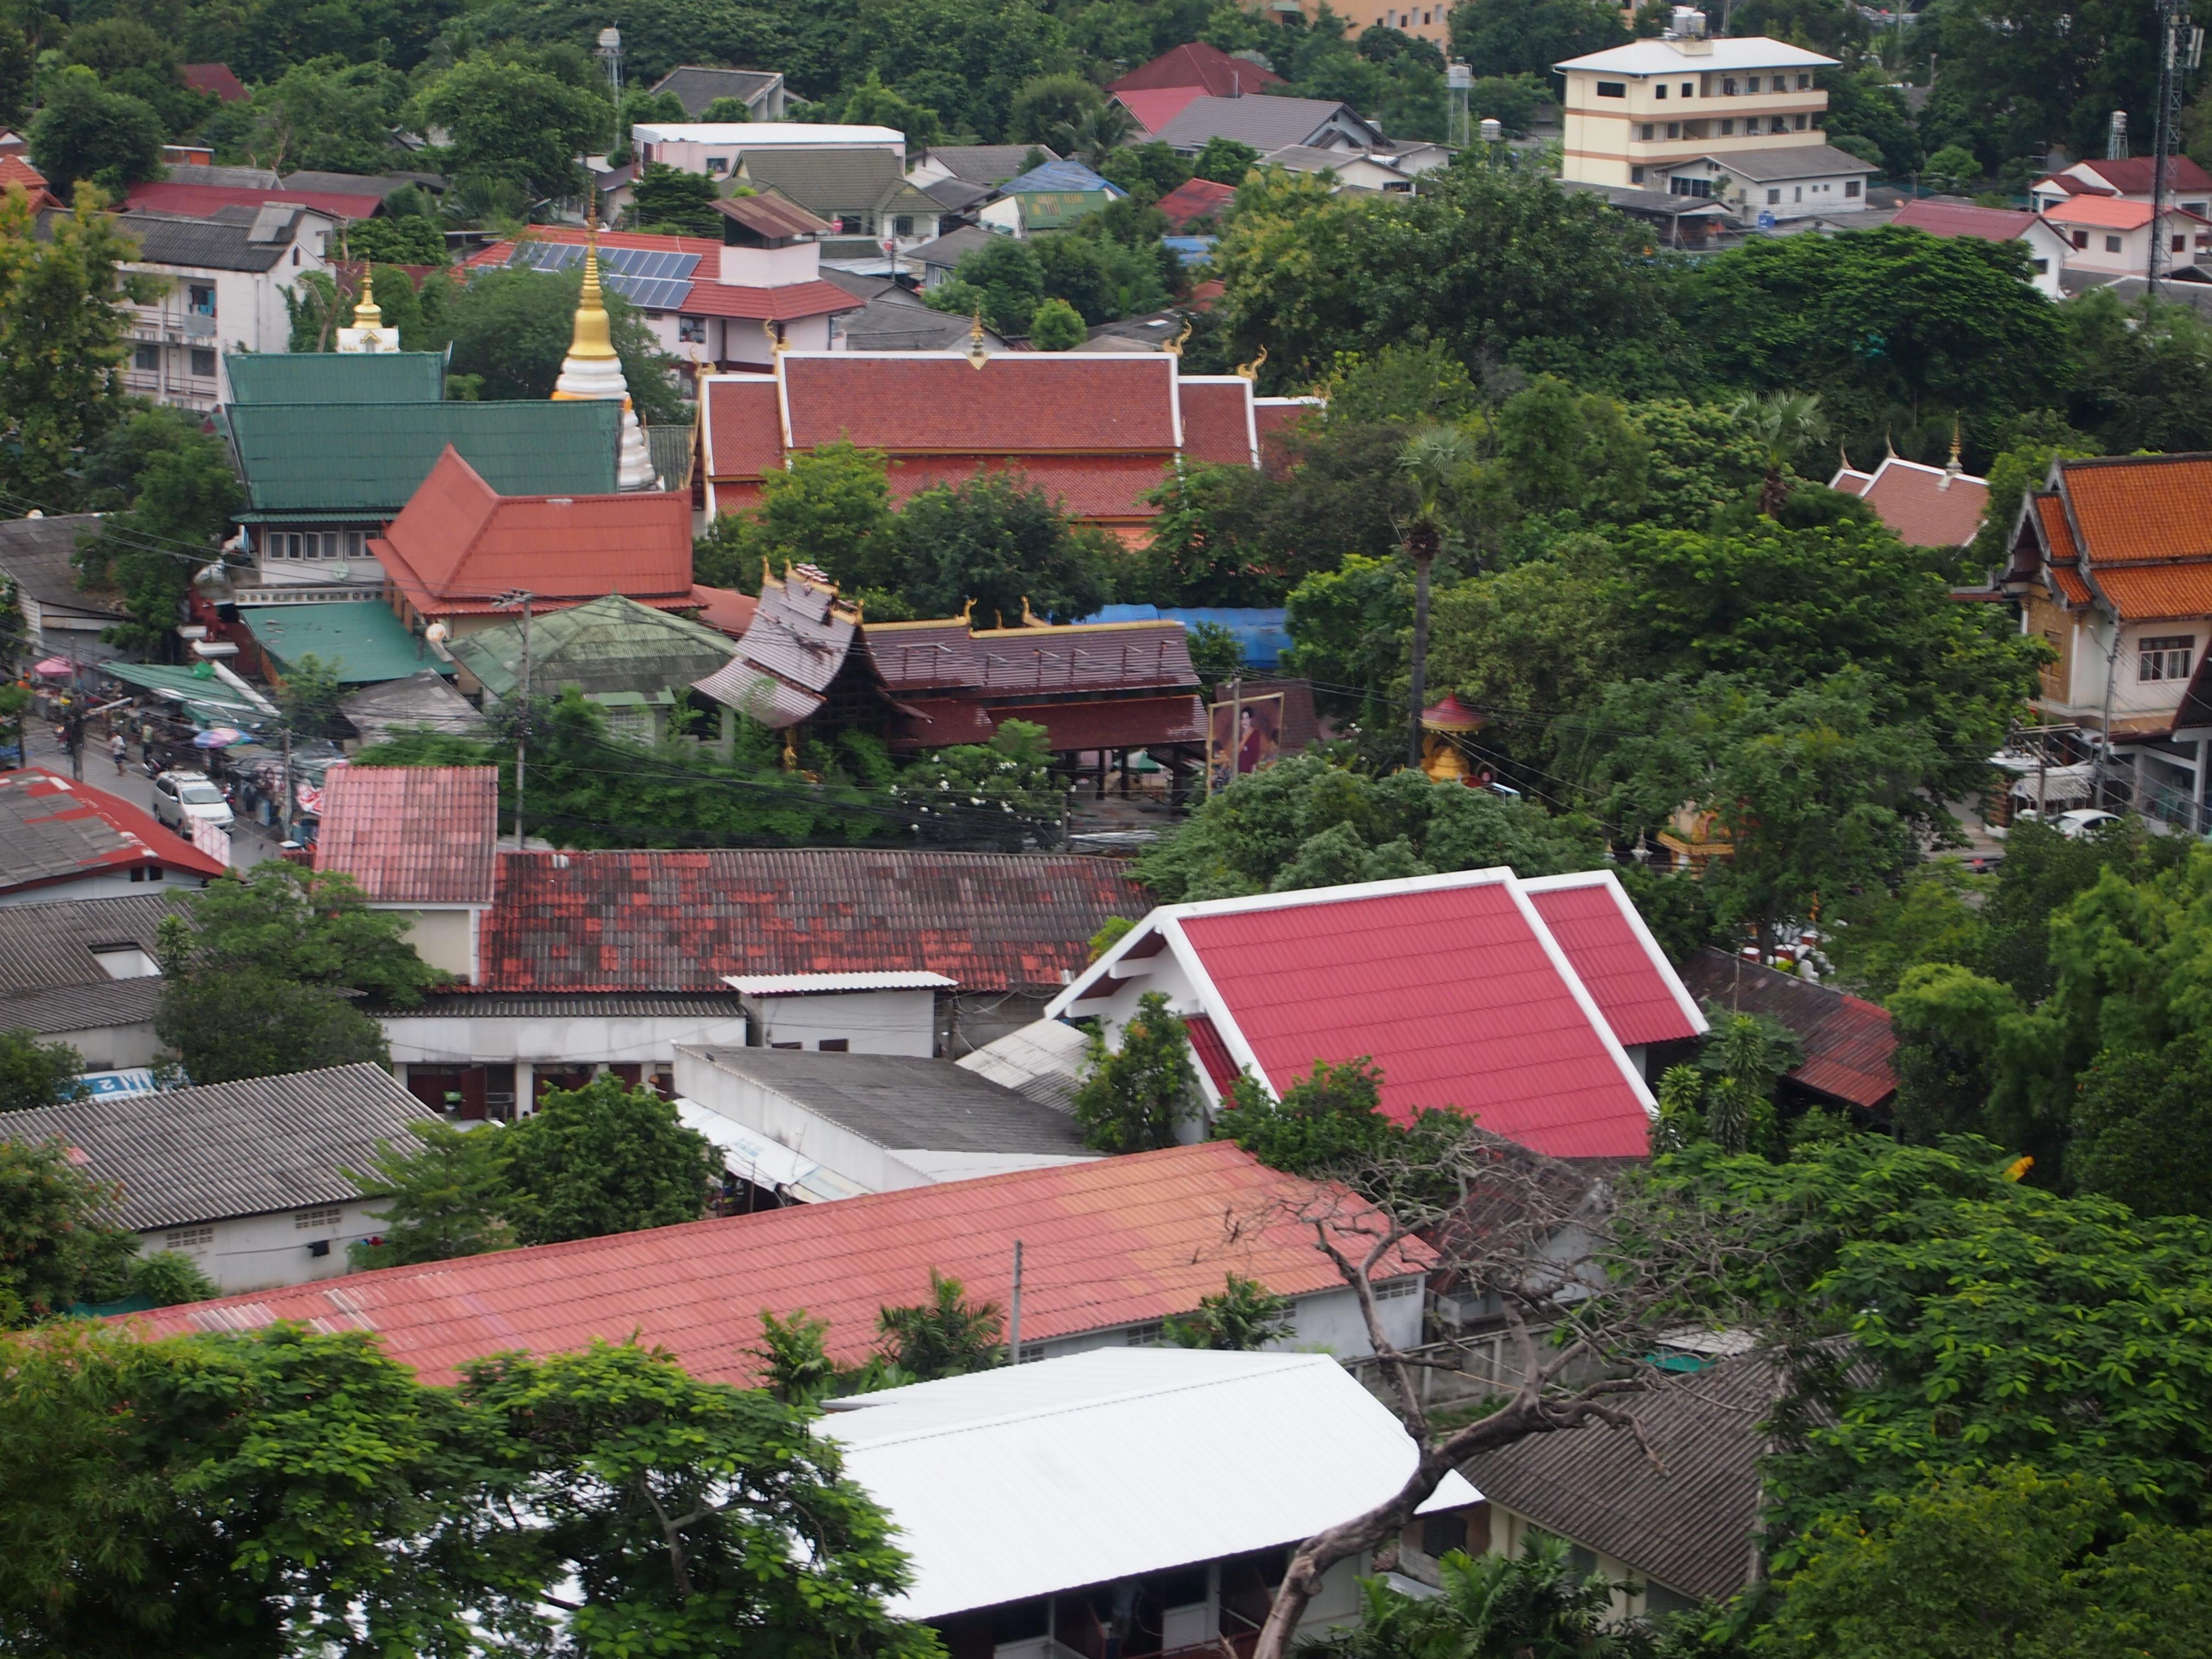 Tilbage i fantastiske Chiang Mai